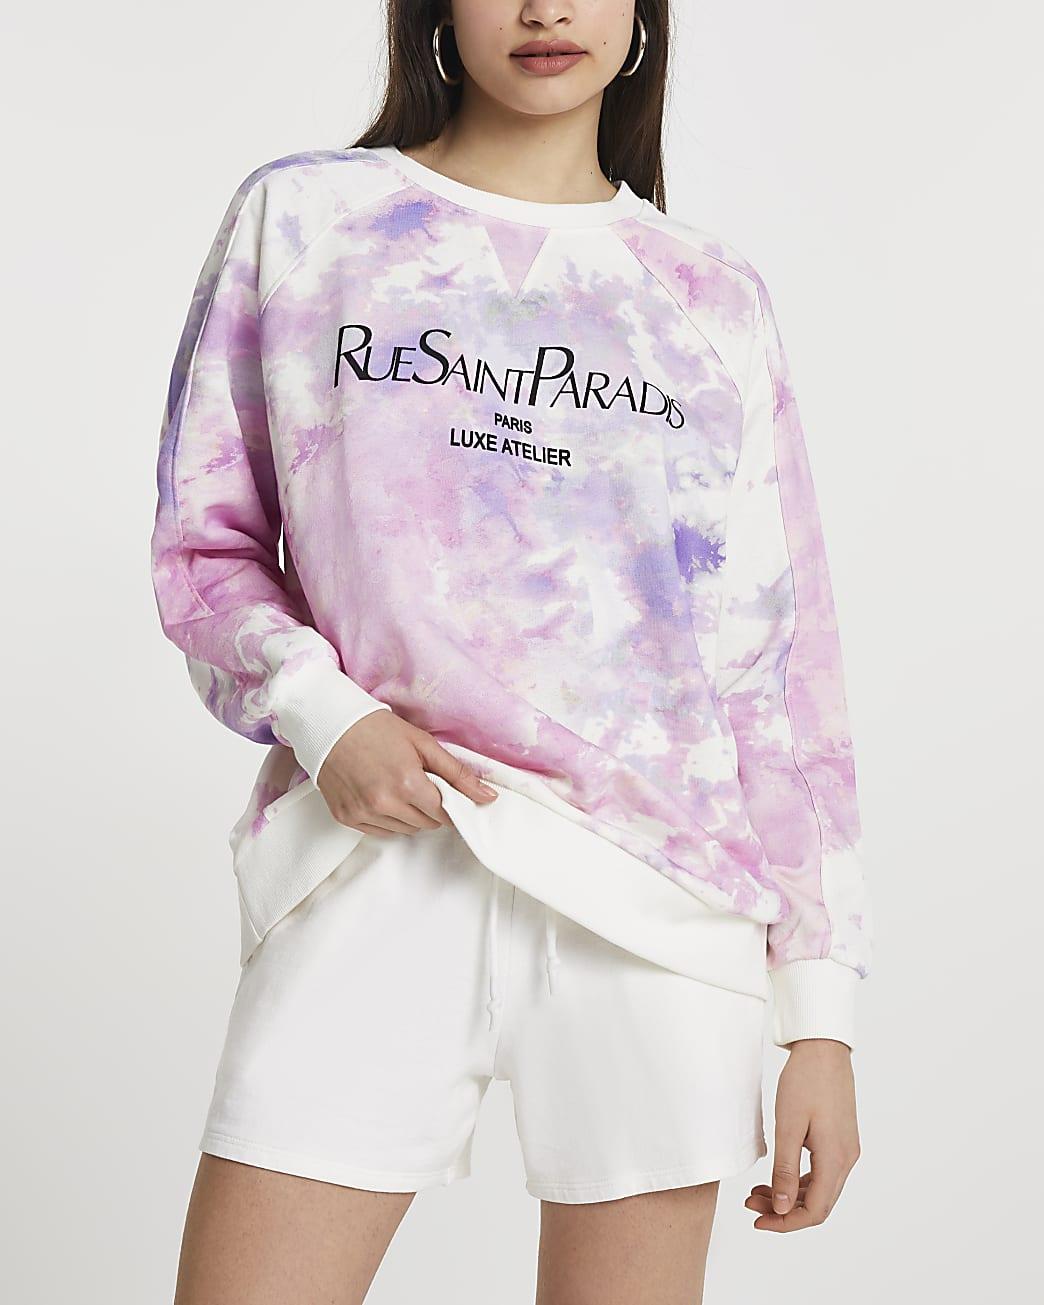 Purple 'Rue Saint Paradis' tie dye sweatshirt